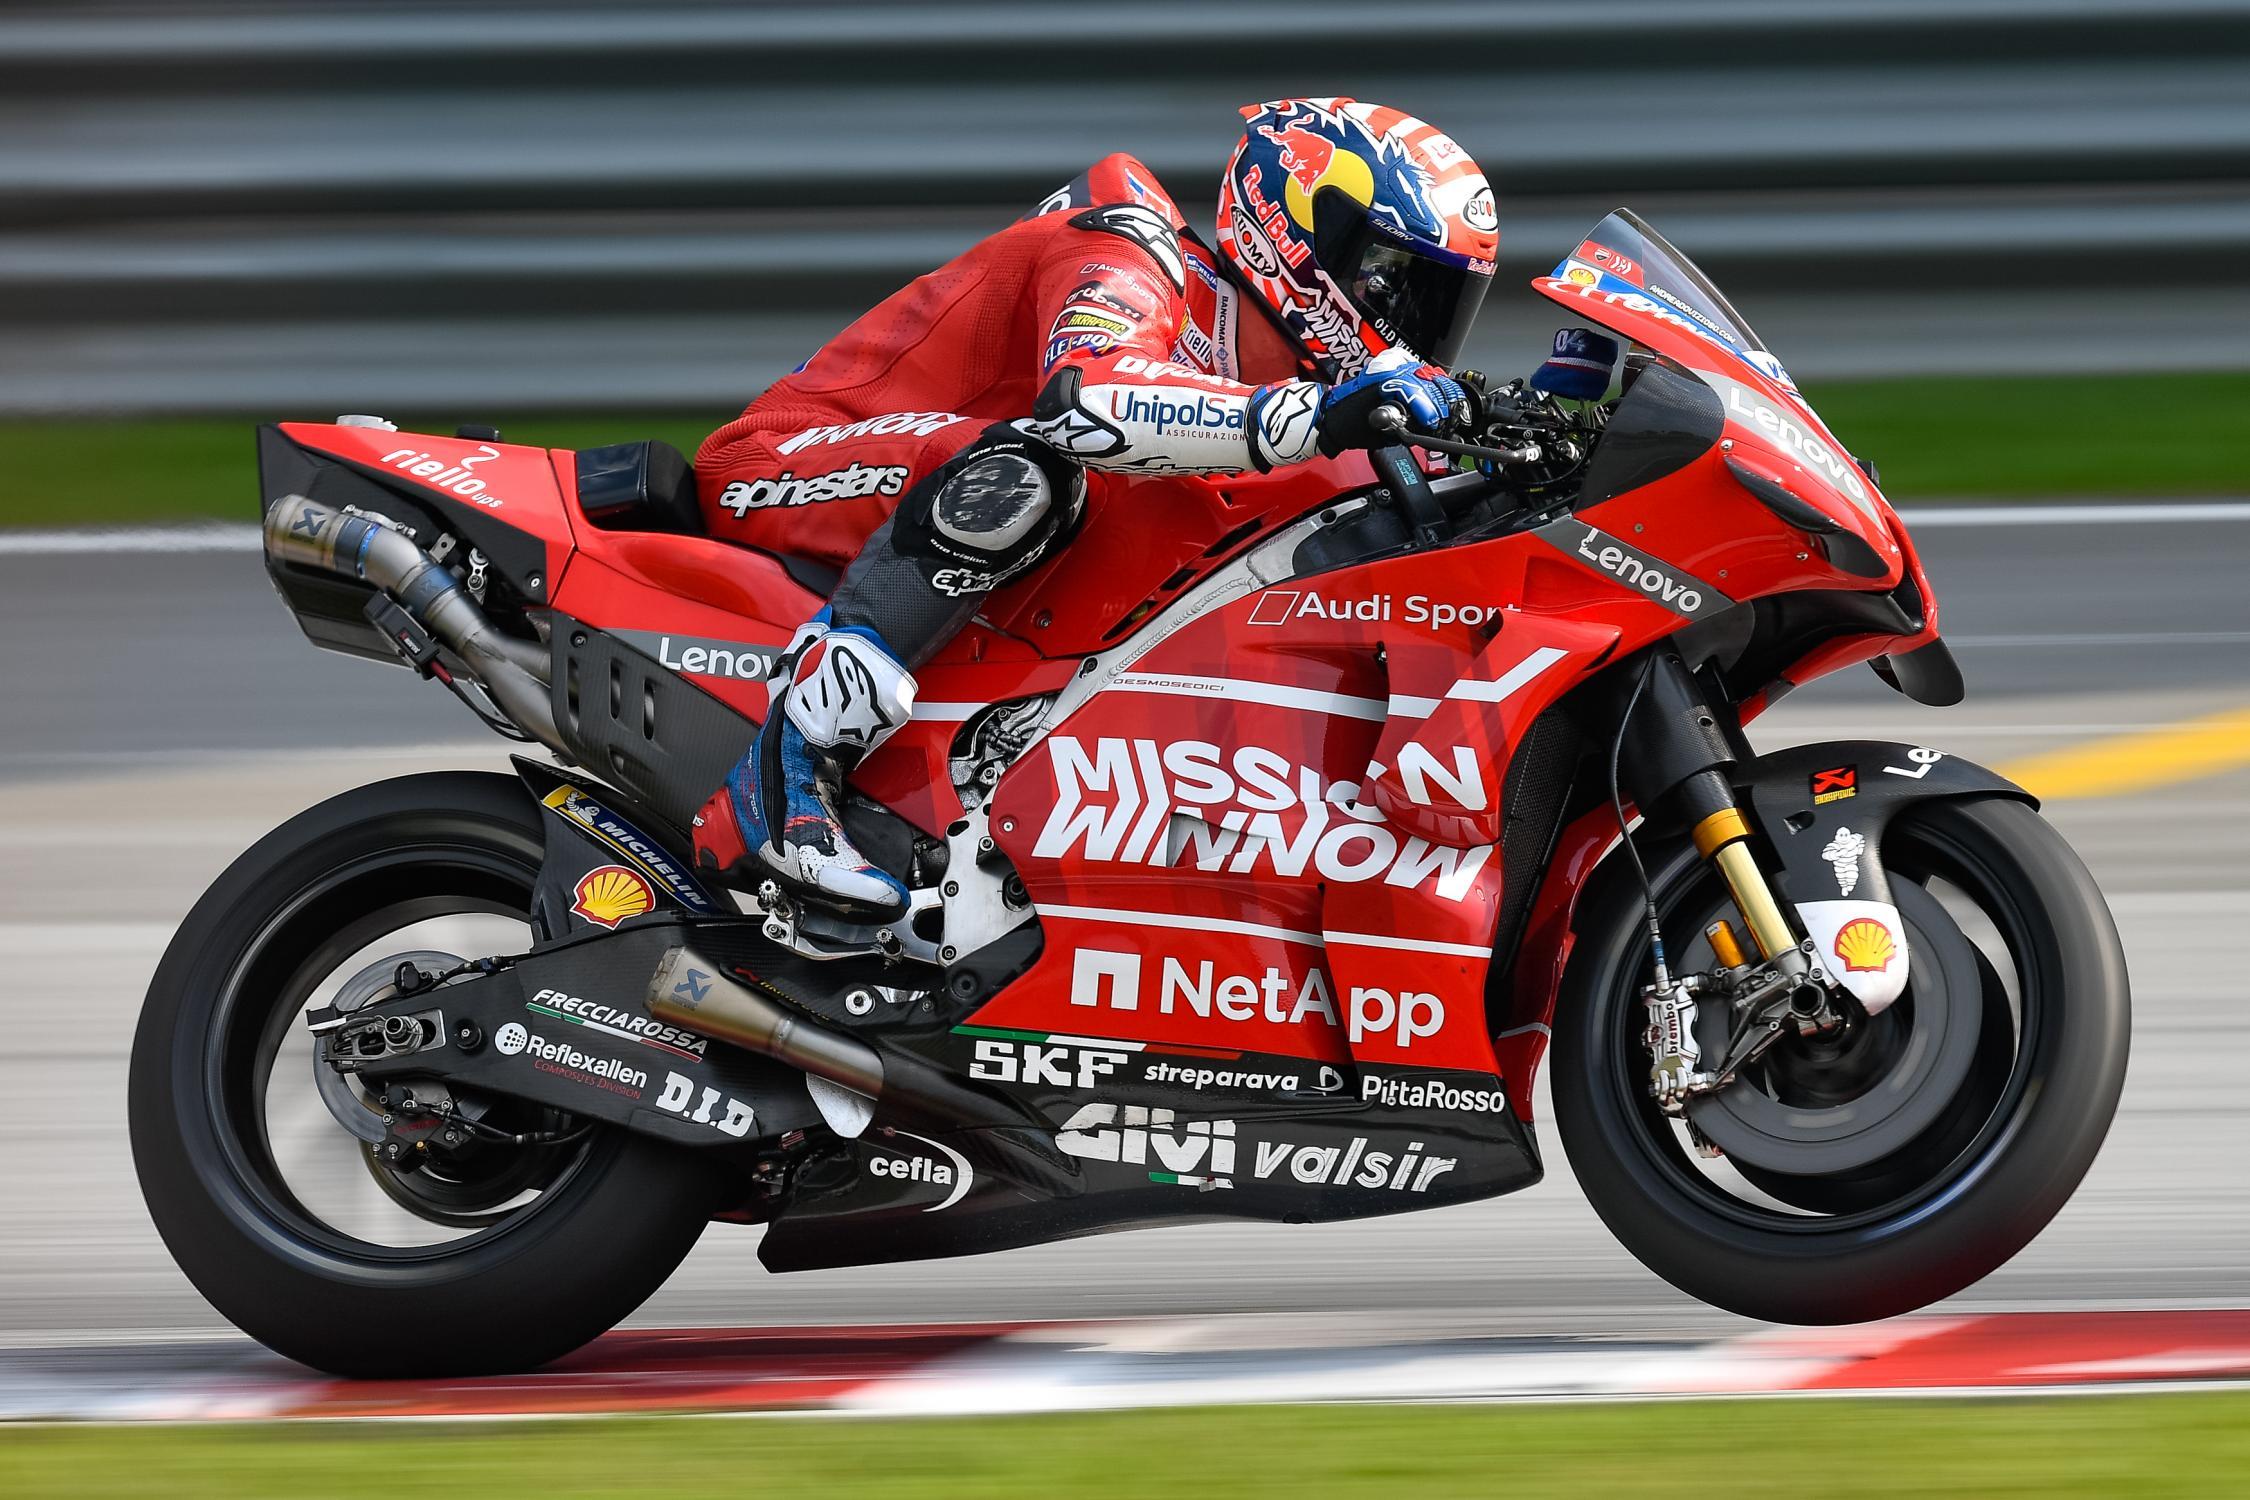 MOTO GP TESTS 2019 - Page 2 Andrea-dovizioso-sepang-test-j1-motogp-2019